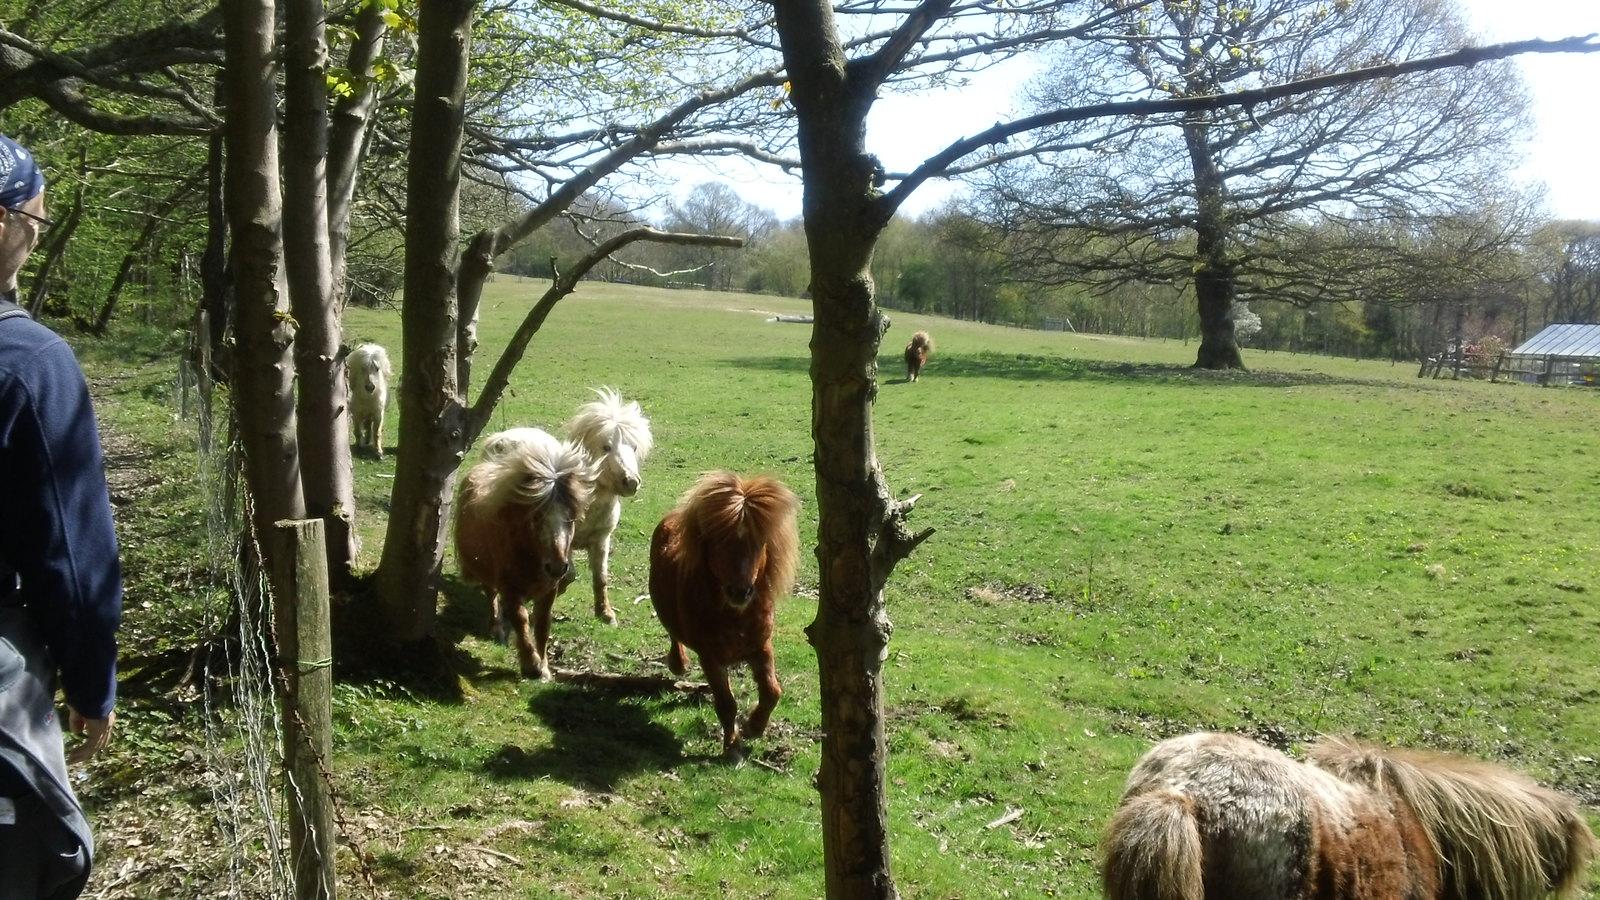 More friendly ponies!